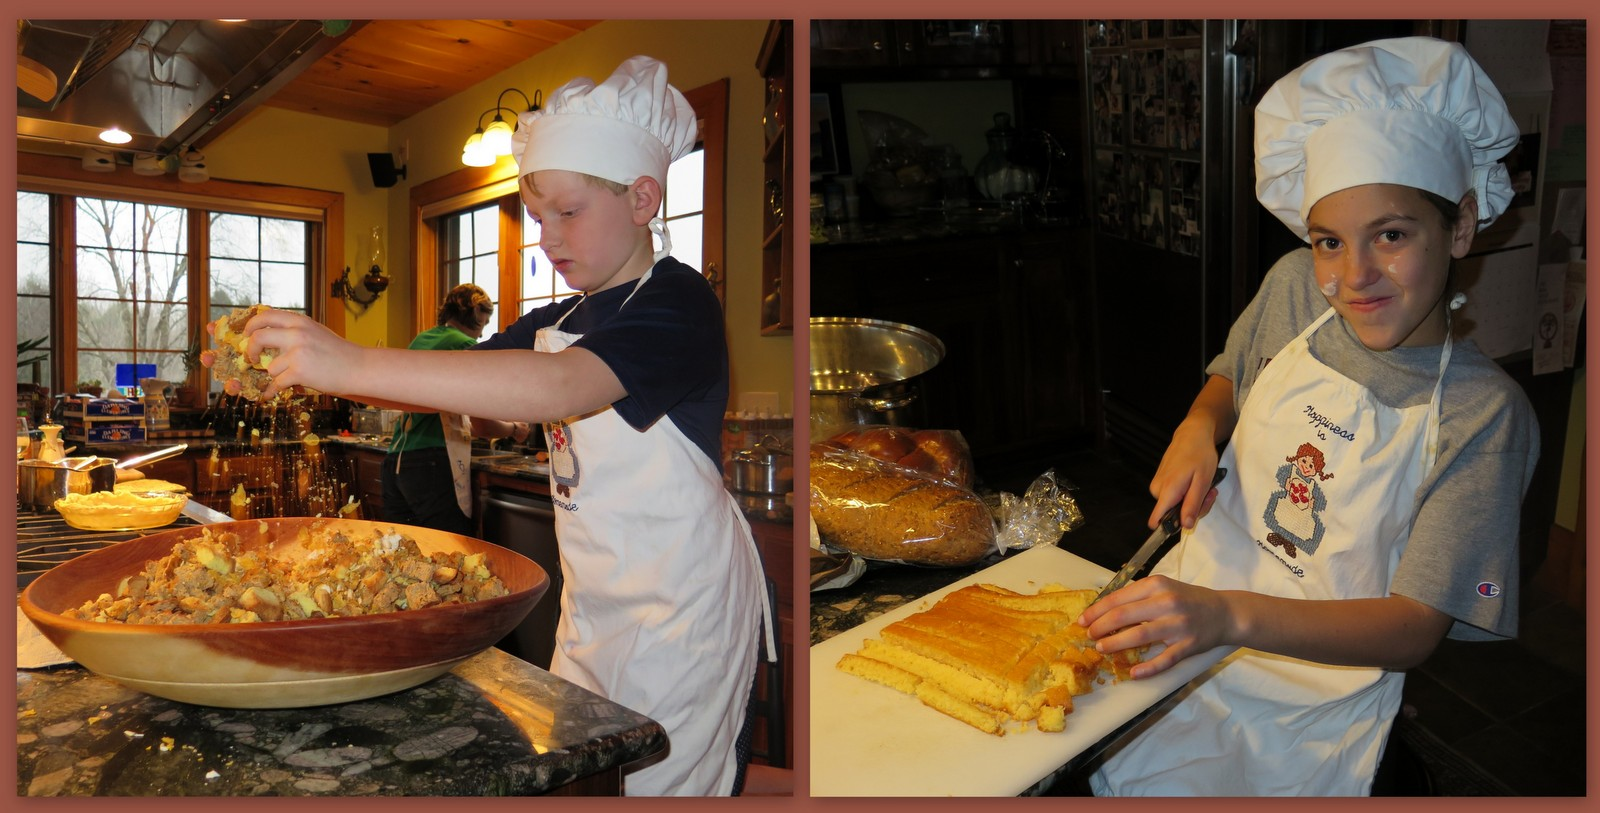 Image: Kids cooking Thanksgiving recipes